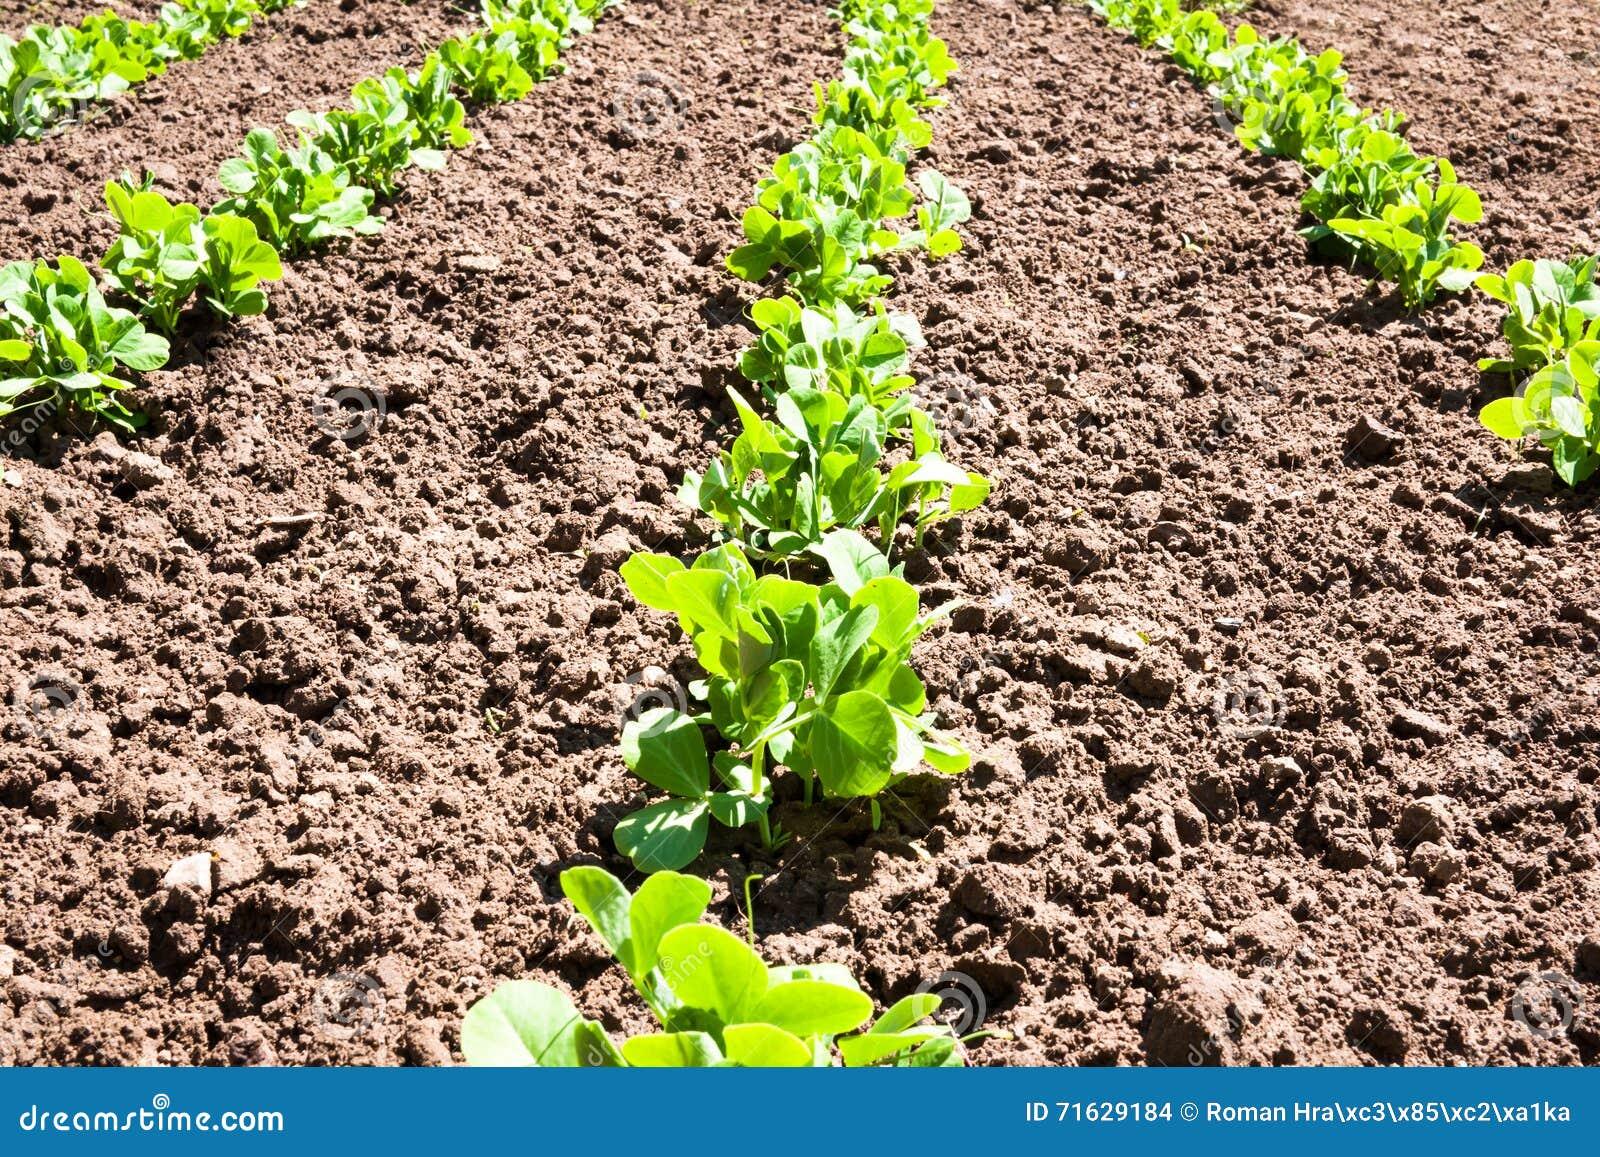 Peas home plantation stock photo. Image of farming, ground - 71629184